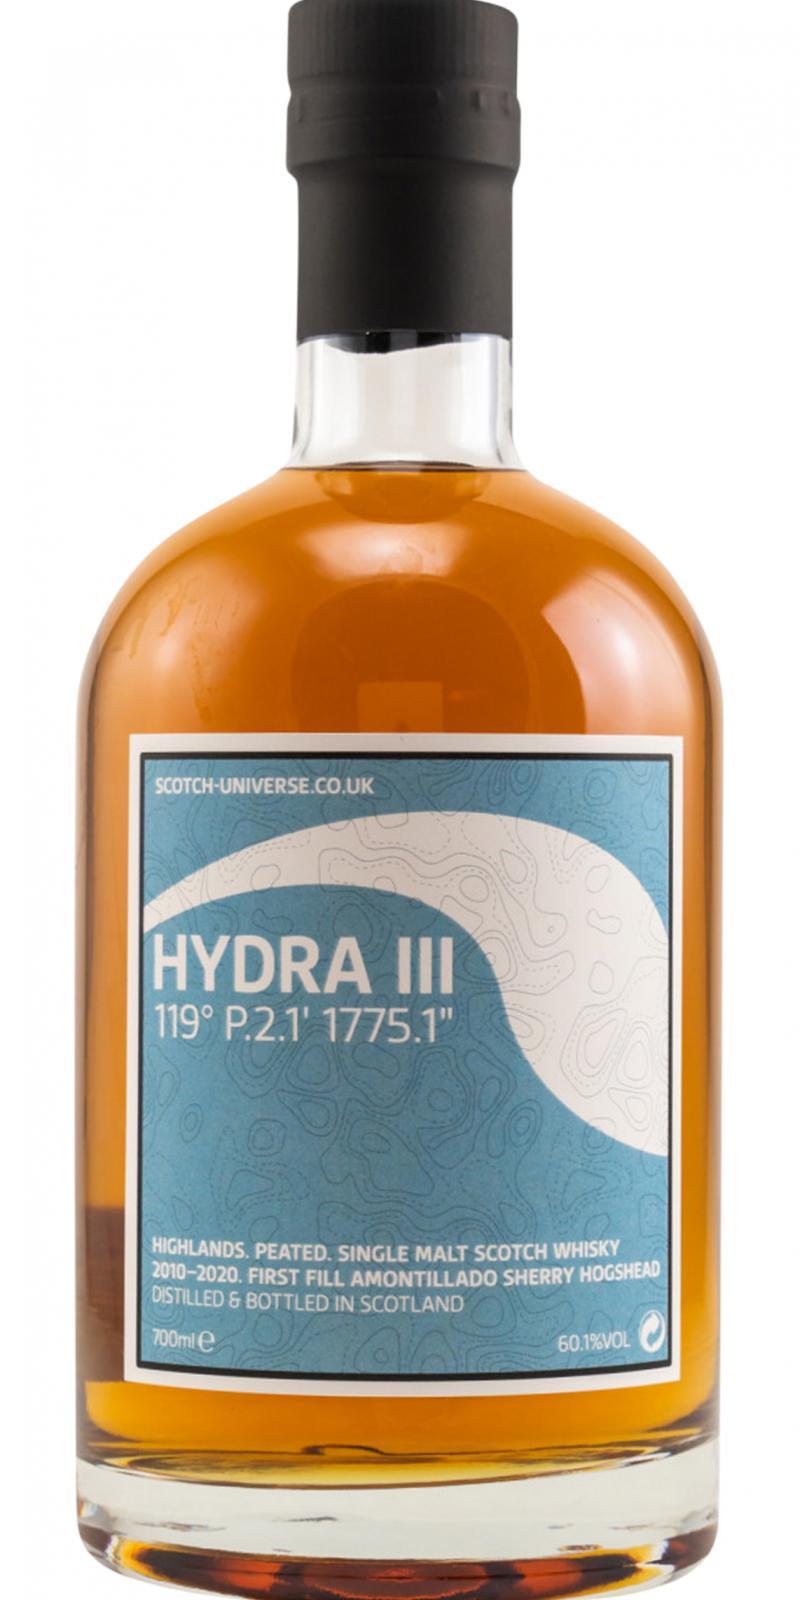 "Scotch Universe Hydra III - 119° P.2.1' 1775.1"""